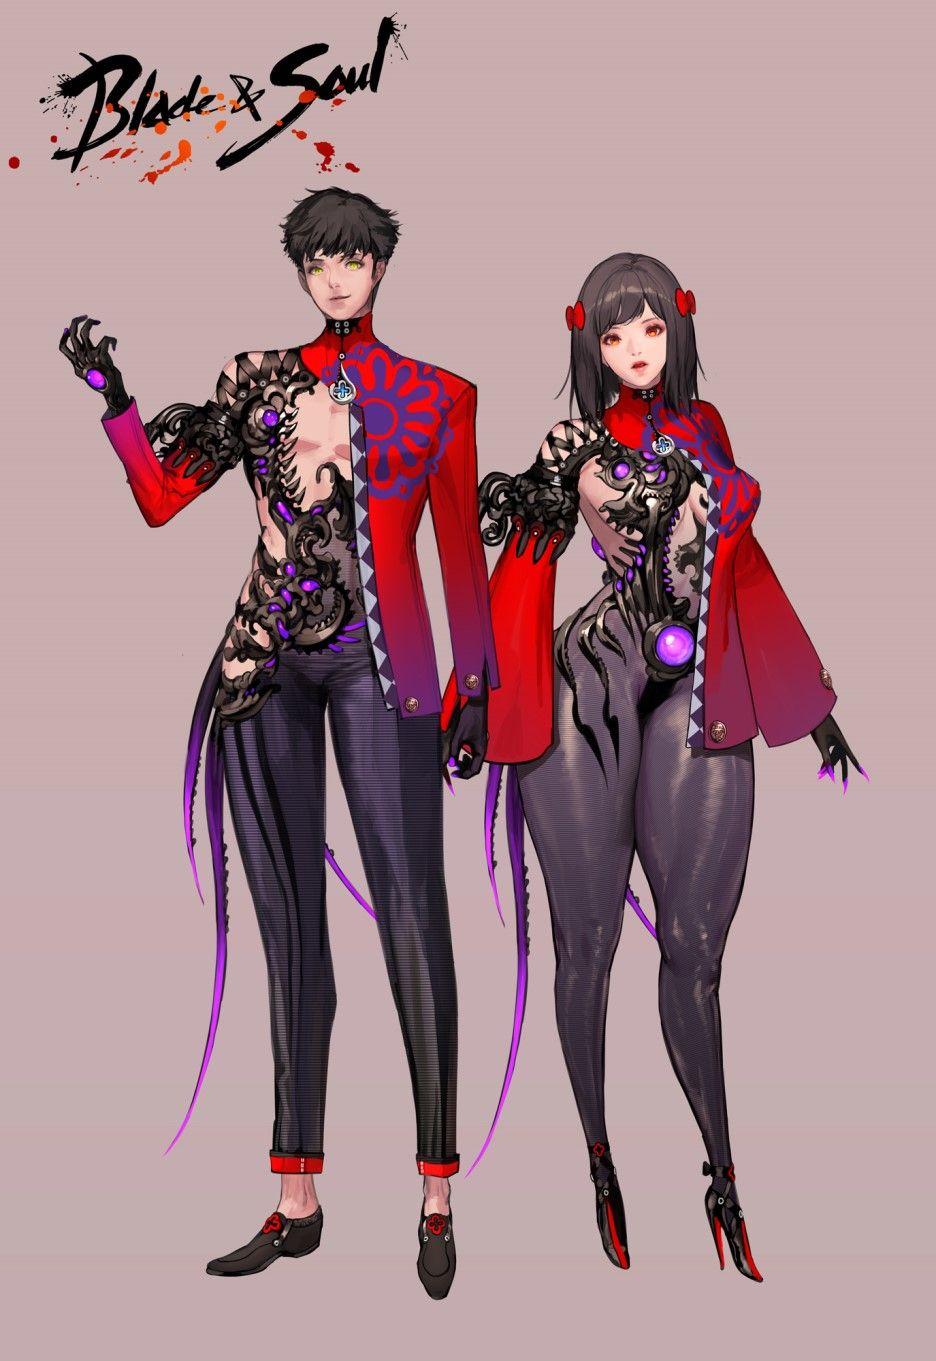 Blade and Soul designs by Hyulla 애증, 새, 감정